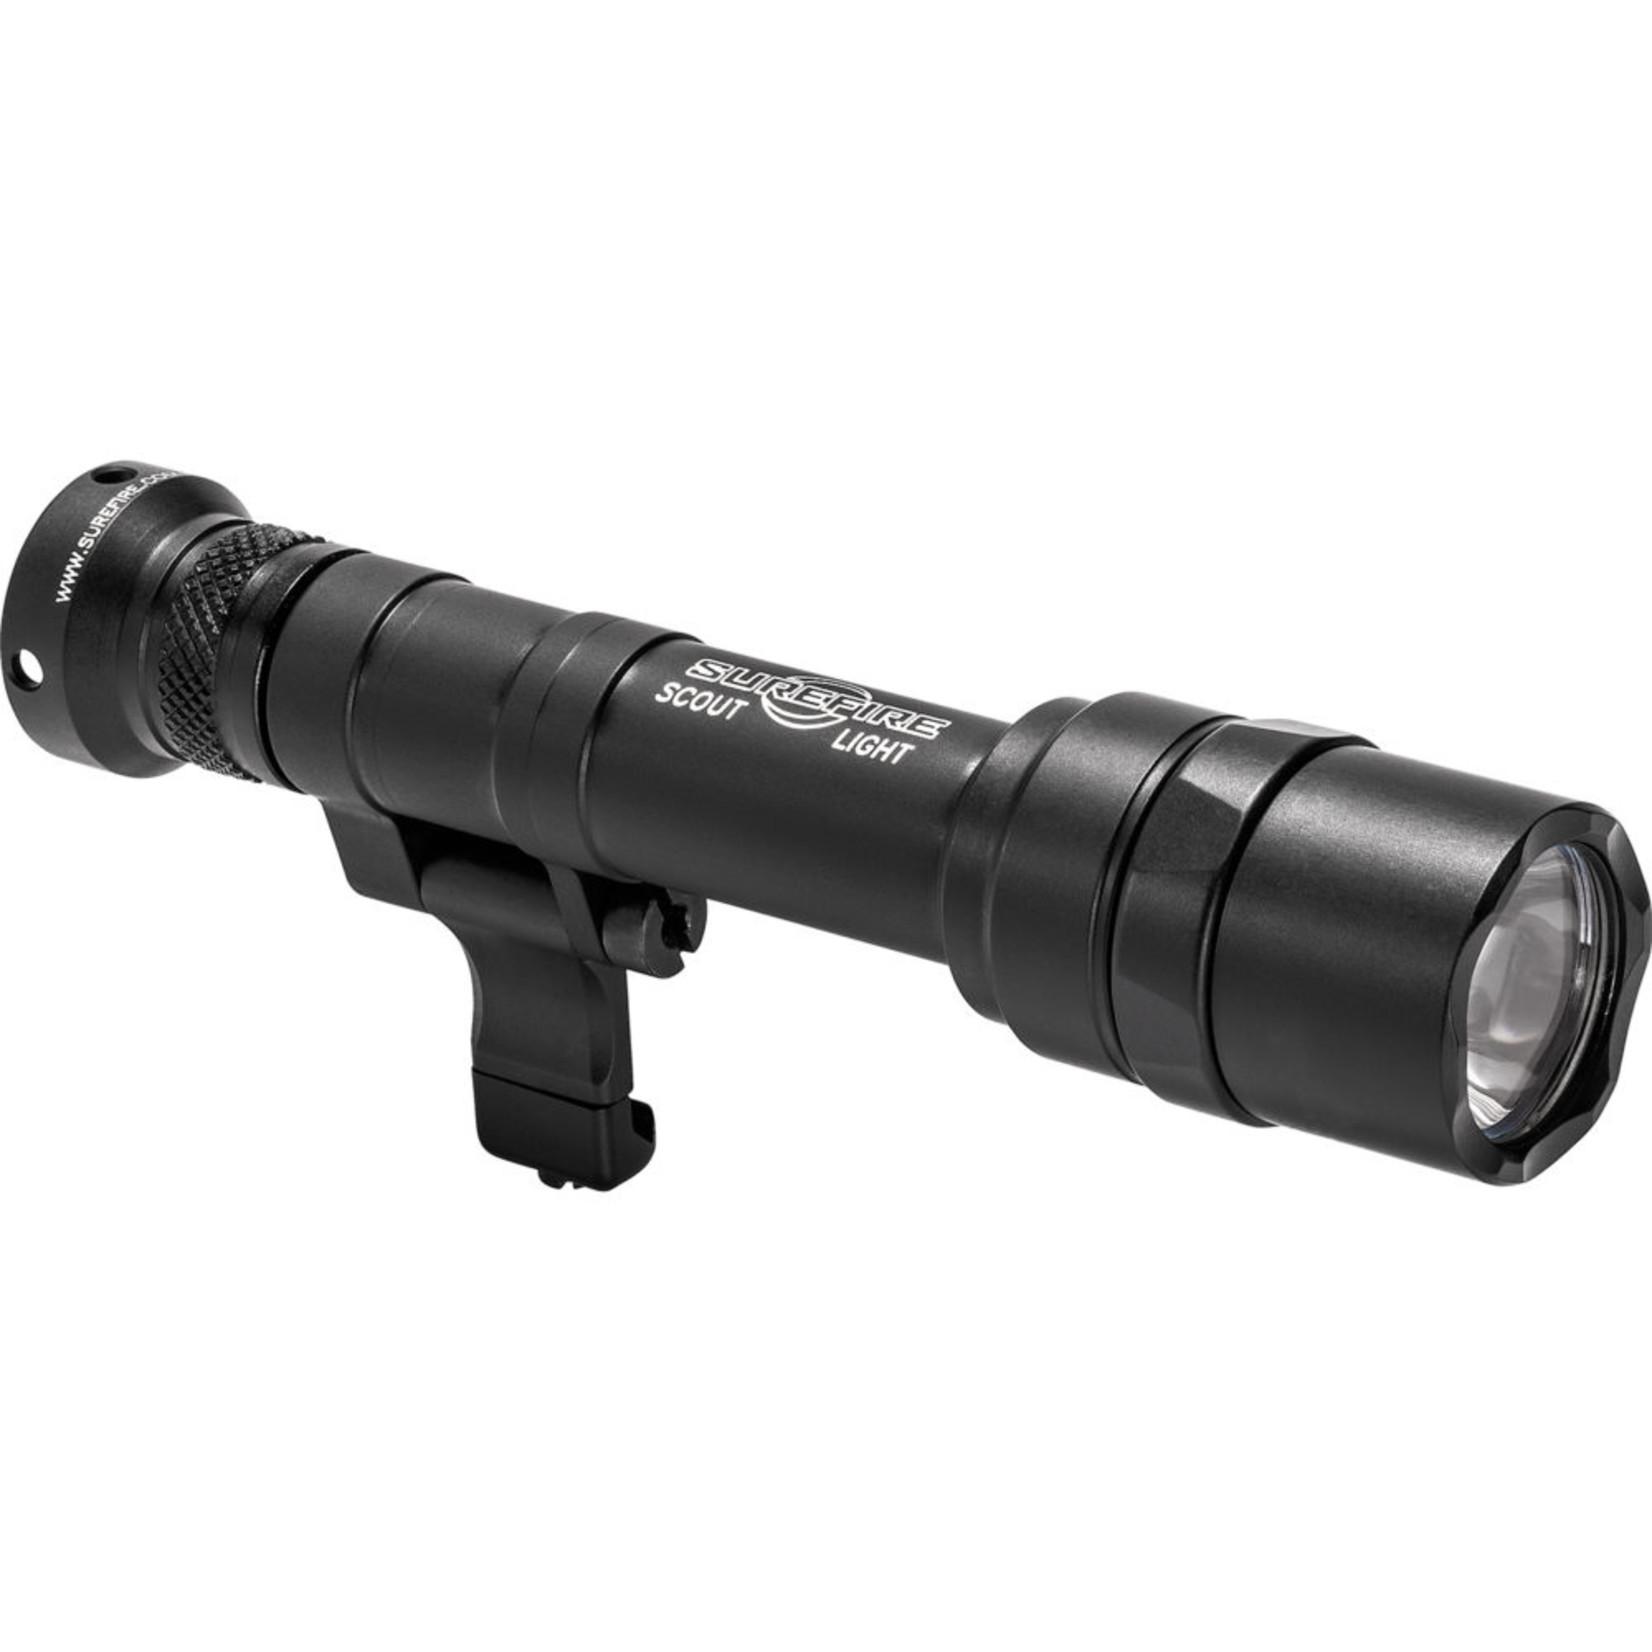 SUREFIRE M640U SCOUT LIGHT PRO